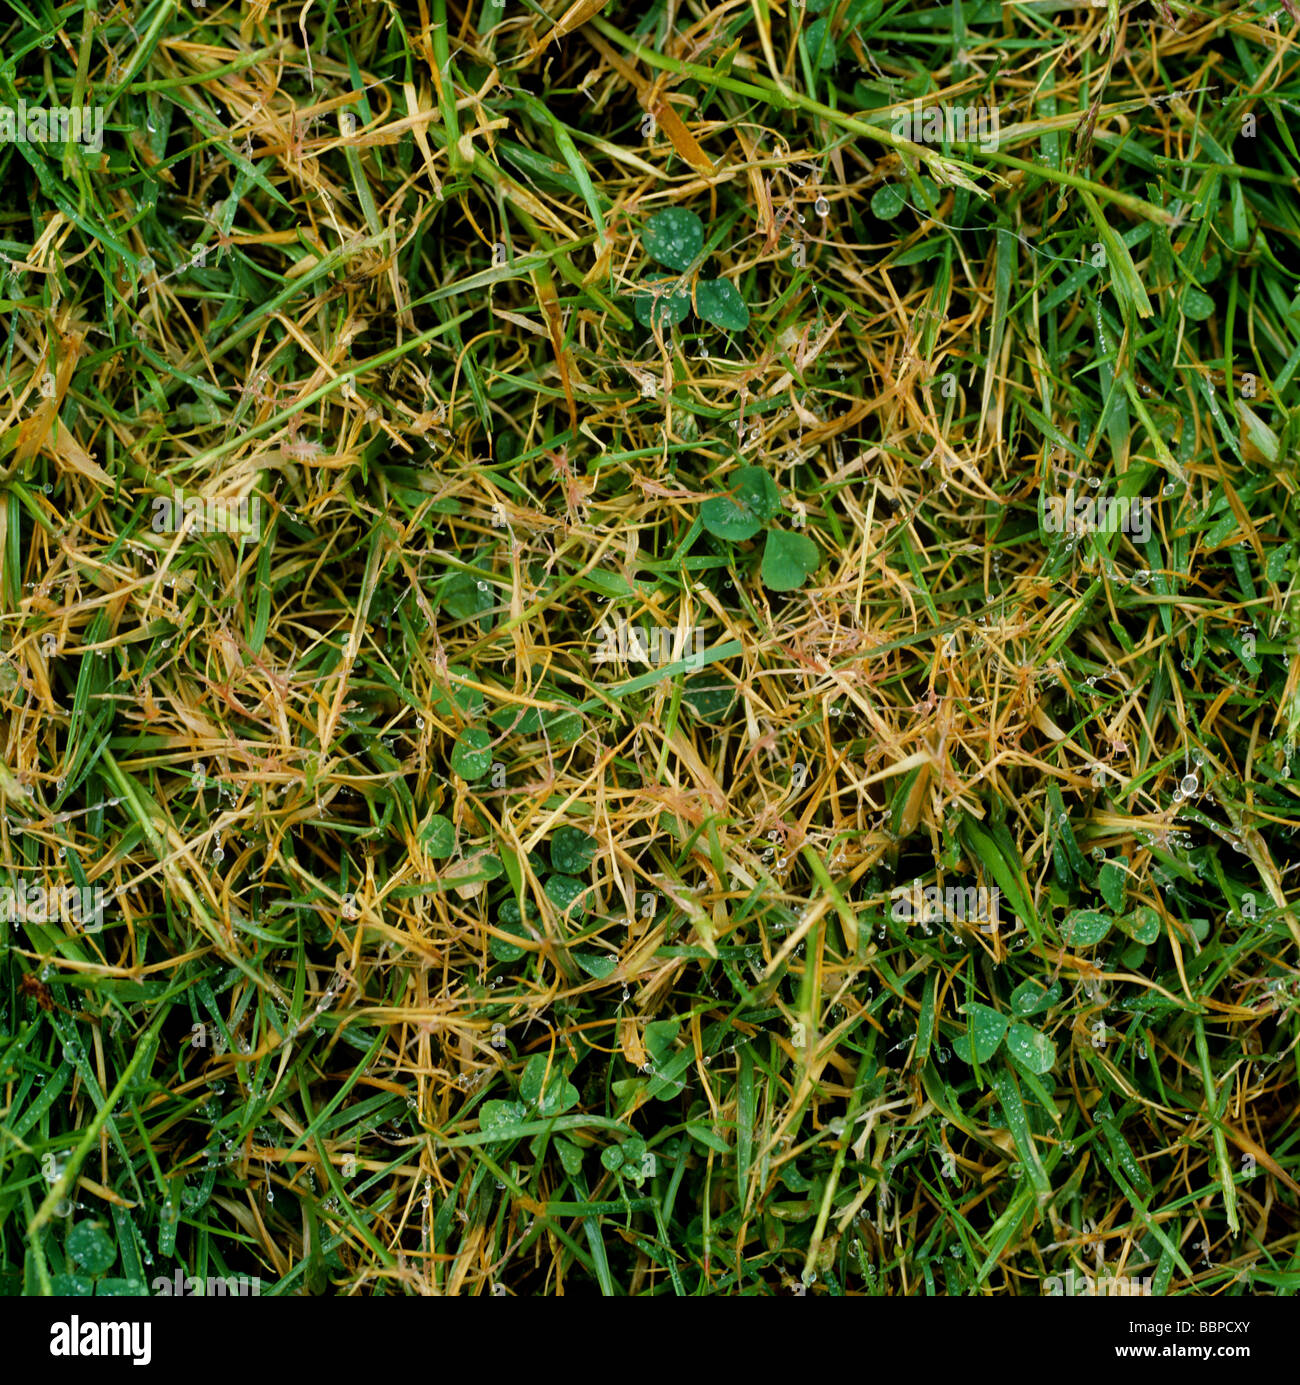 Kunstrasen Rasen Patch mit roter Faden Laetisaria Fuciformis Infektion Stockbild